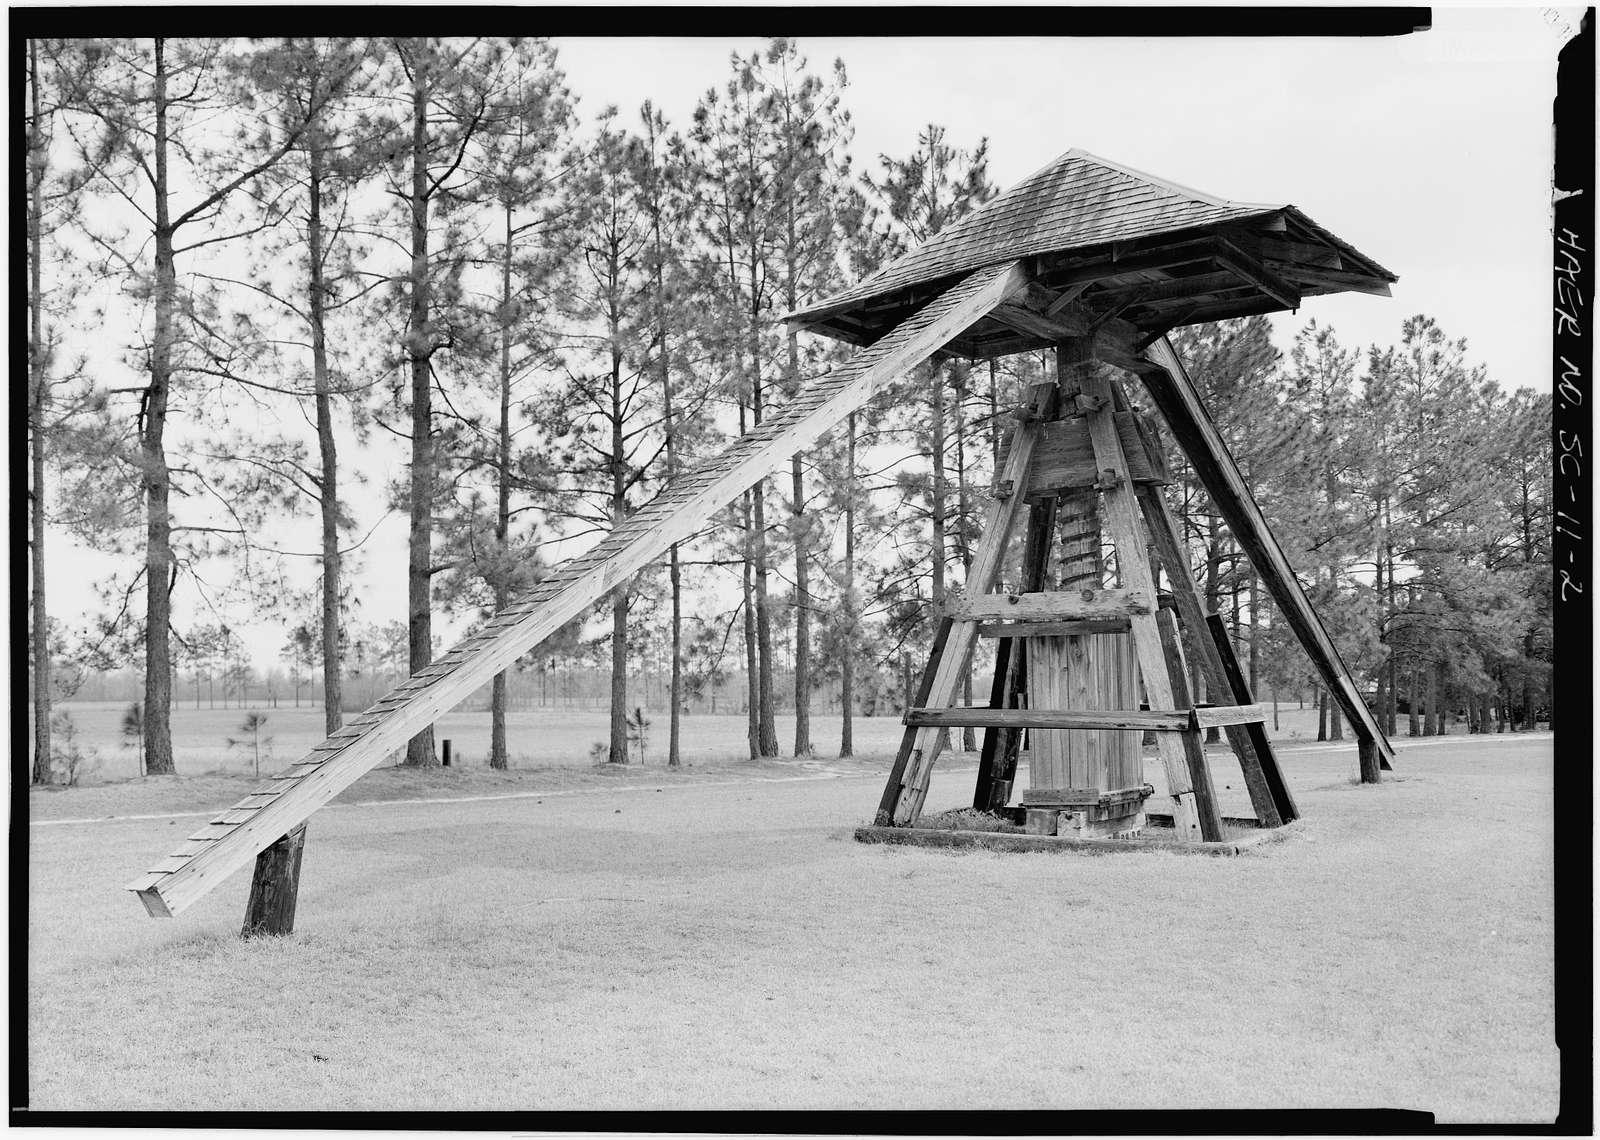 Cotton Press, Near Routes 917 & 38, moved from Berry's Crossroads, Latta, Dillon County, SC